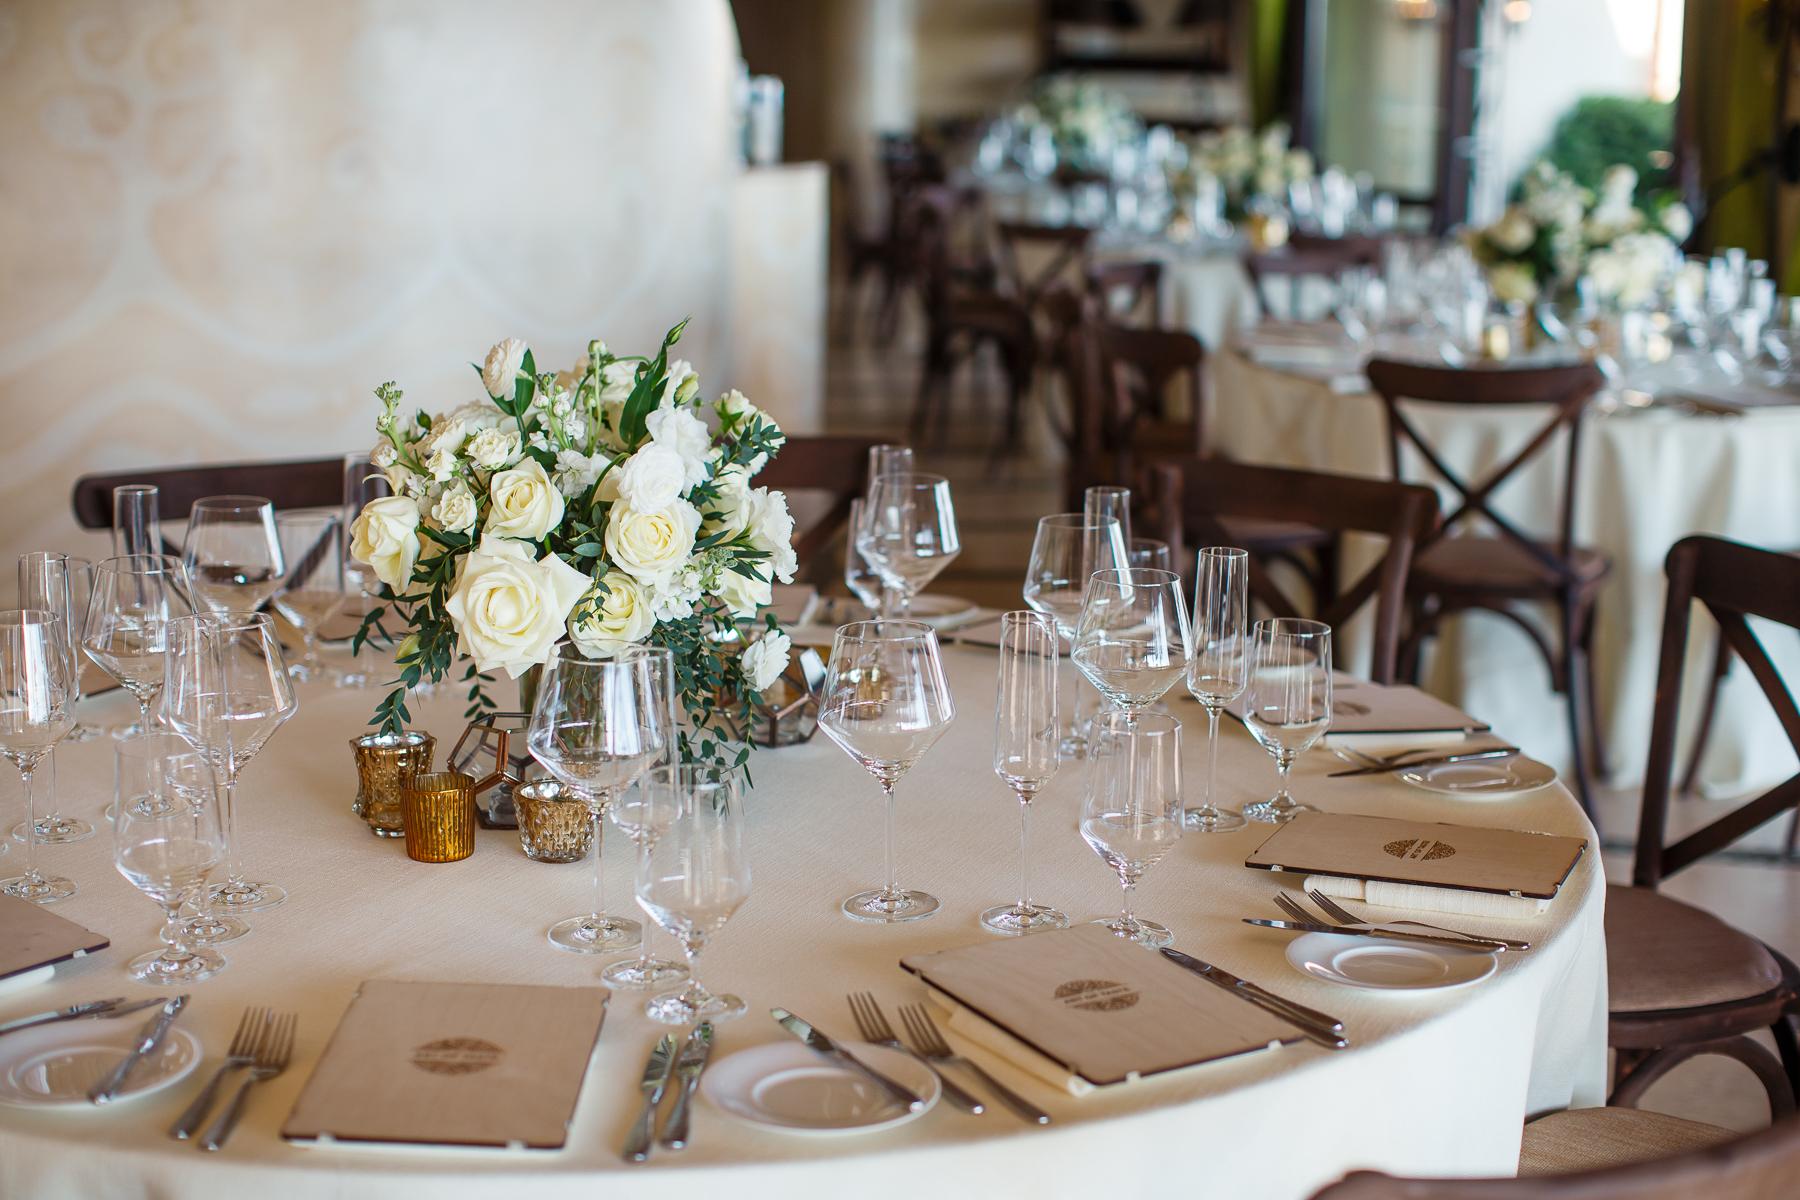 29.10.16 Art of Taste. Gala Dinner. Julieta Amezcua Cabo Wedding Photography.  (5 of 183).jpg